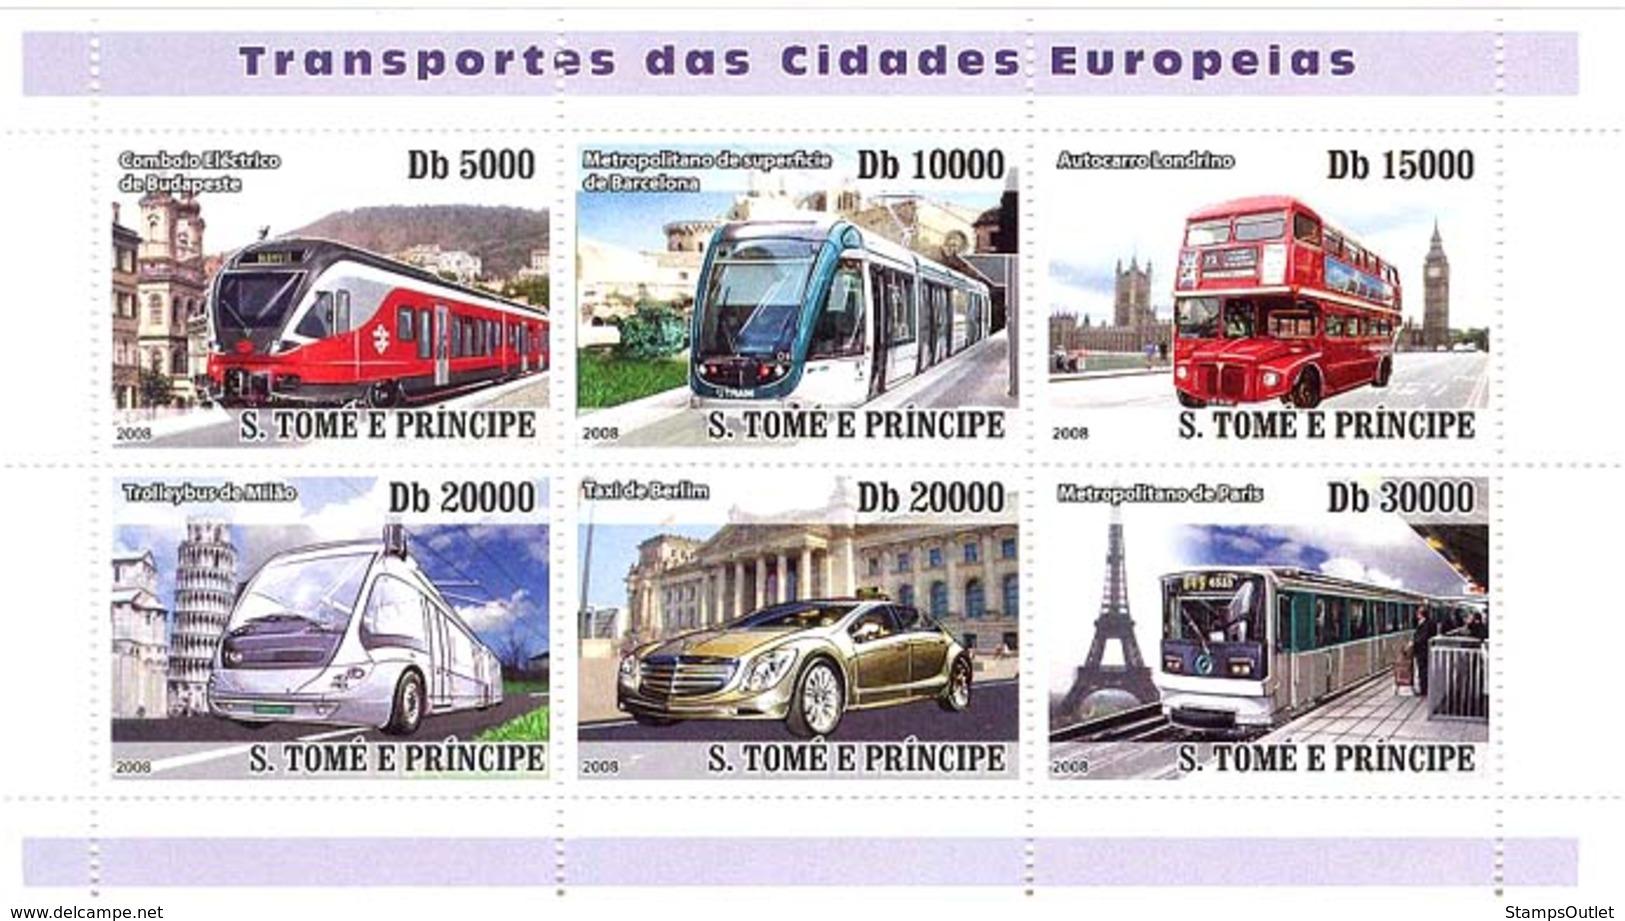 S. TOME & PRINCIPE 2008 - European City Transports (trains, Bus, Auto Taxi) 6v - YT 2722-2727, Mi 3524-3529 - Sao Tome En Principe